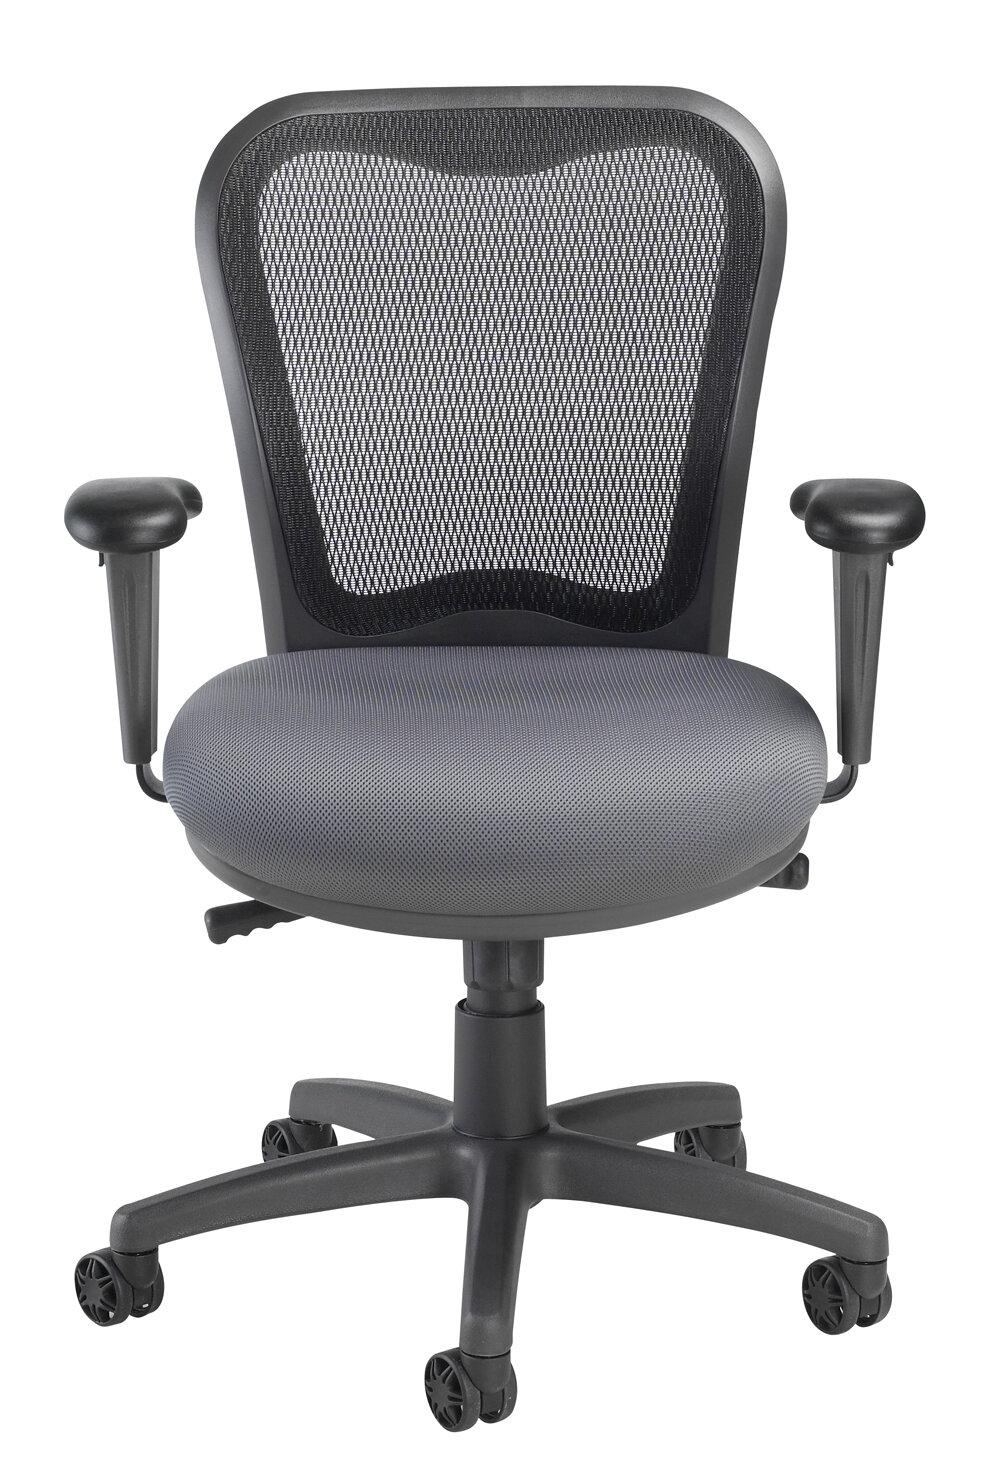 Nightingale Chairs Lxo Mid Back Mesh Desk Chair